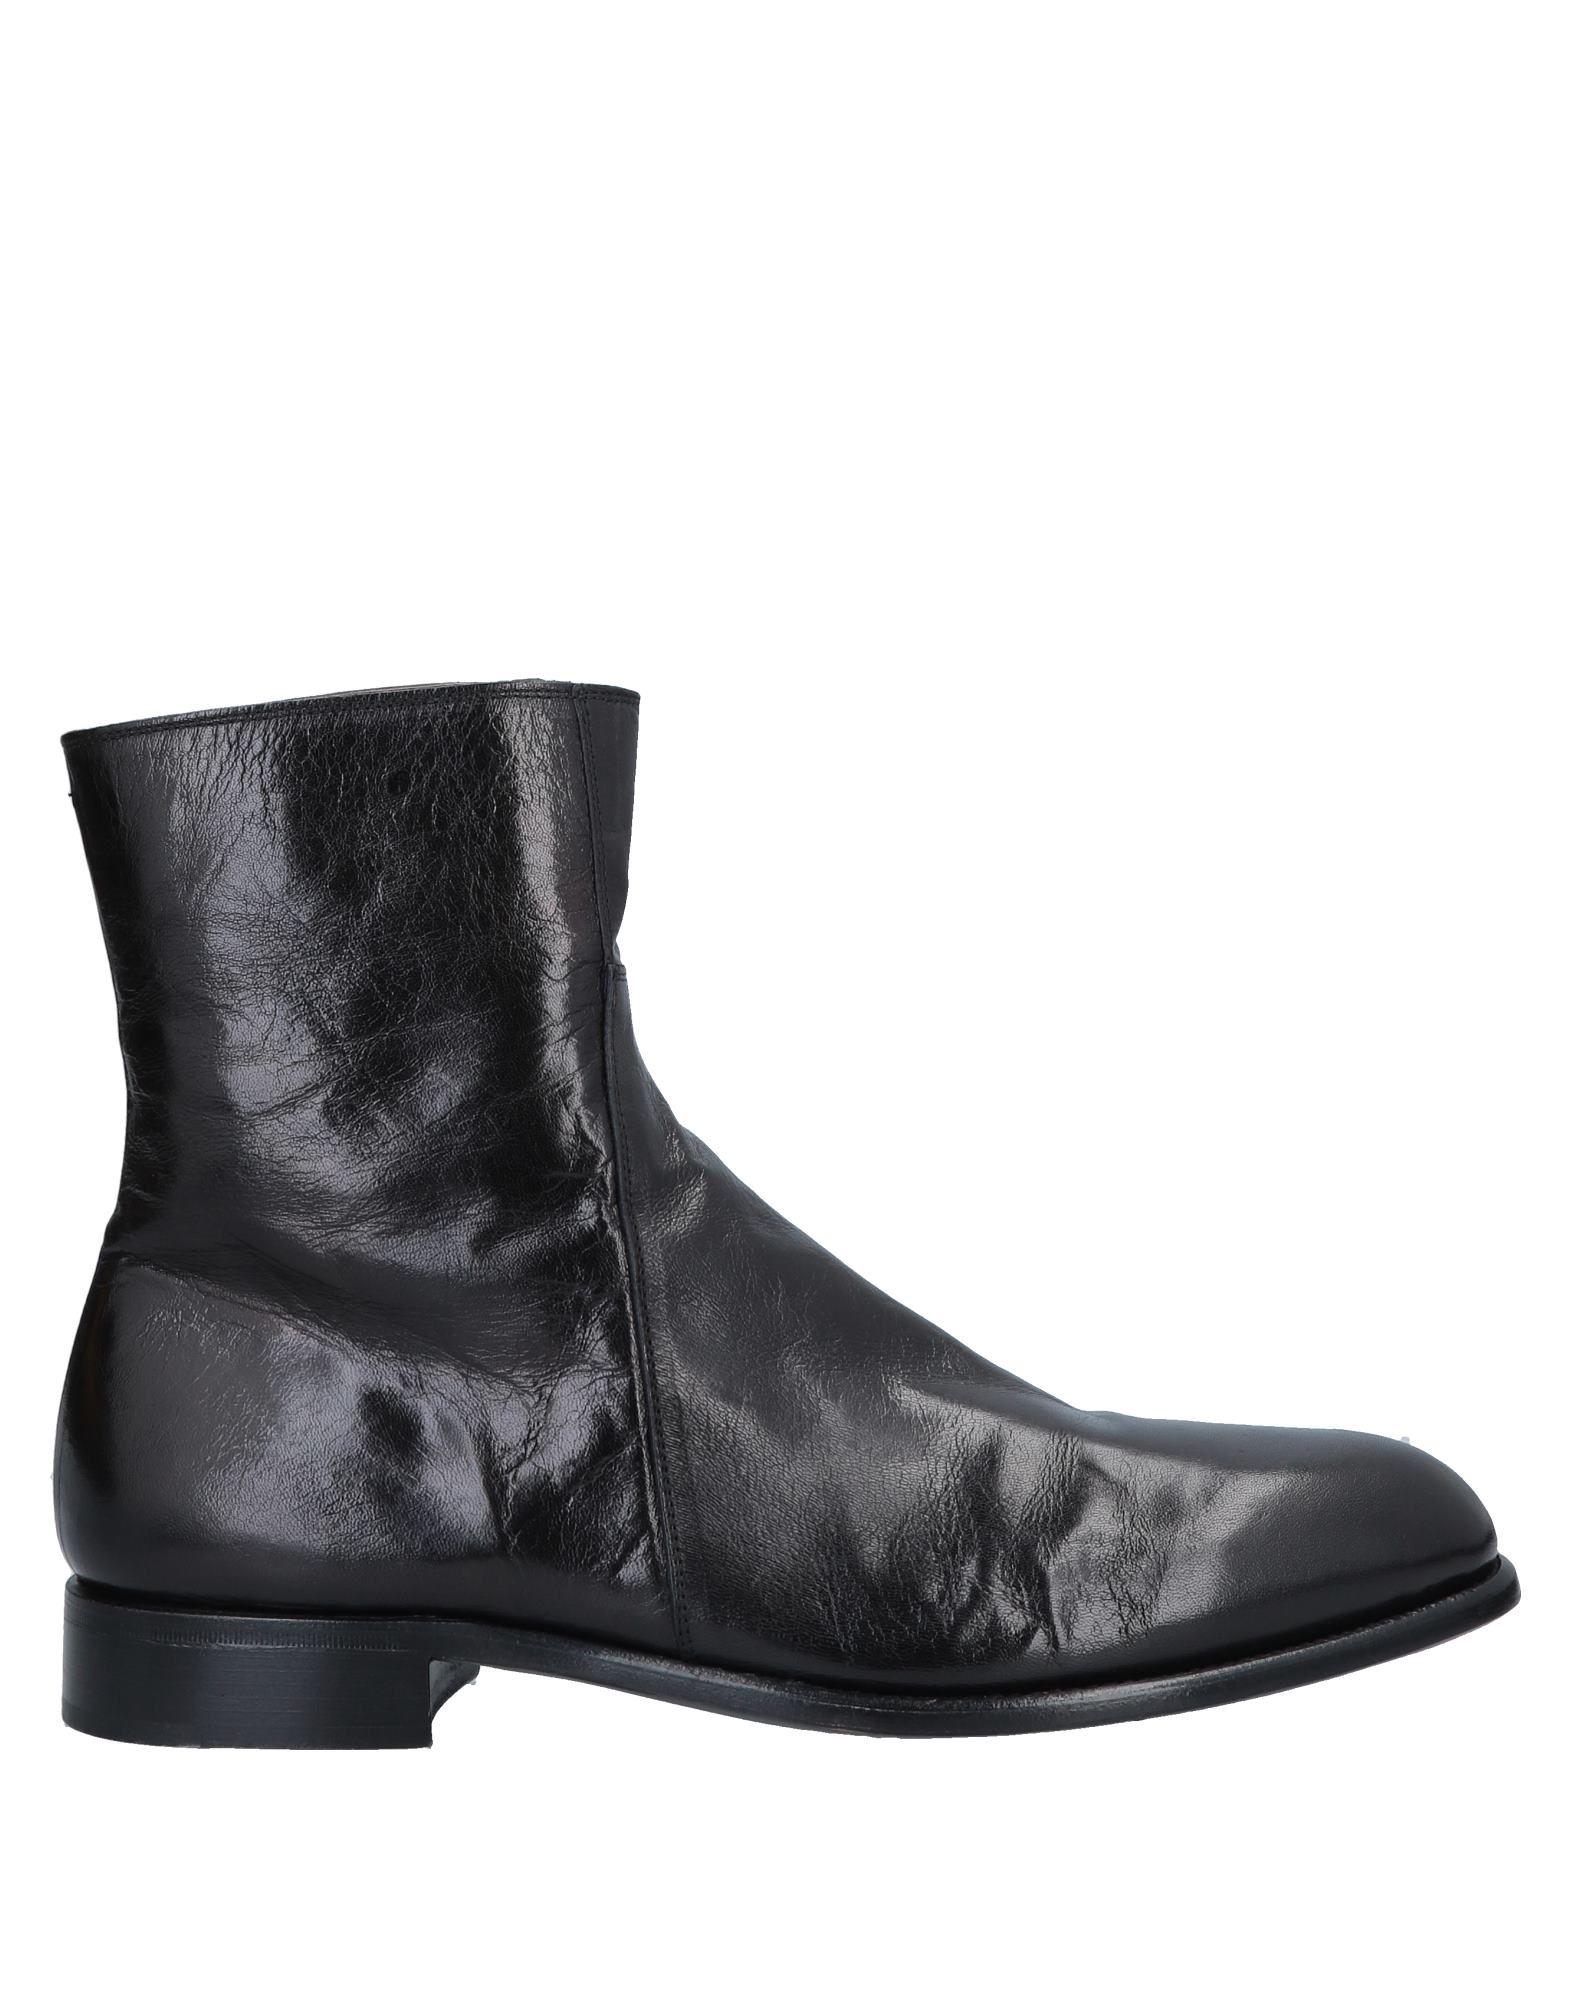 ROCCO P. Полусапоги и высокие ботинки rocco p полусапоги